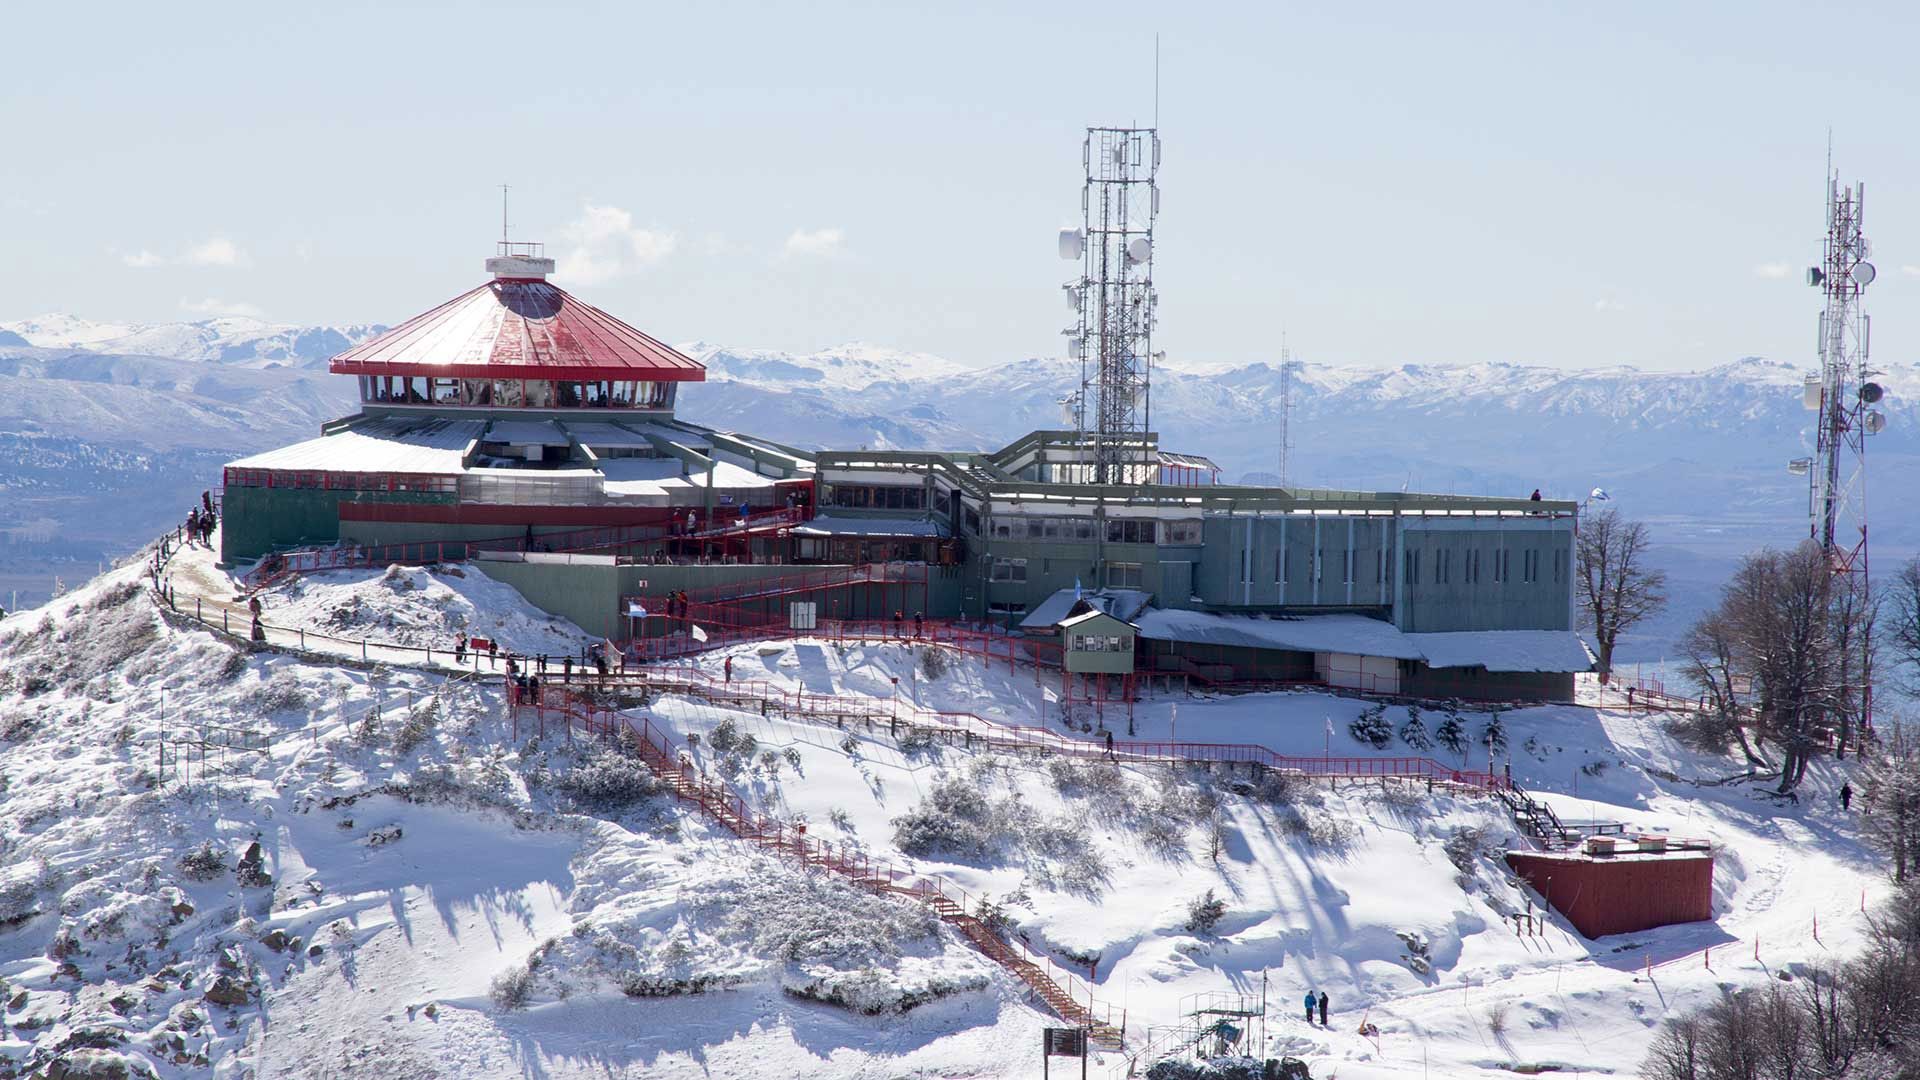 Cerro Otto: cerrado por obras